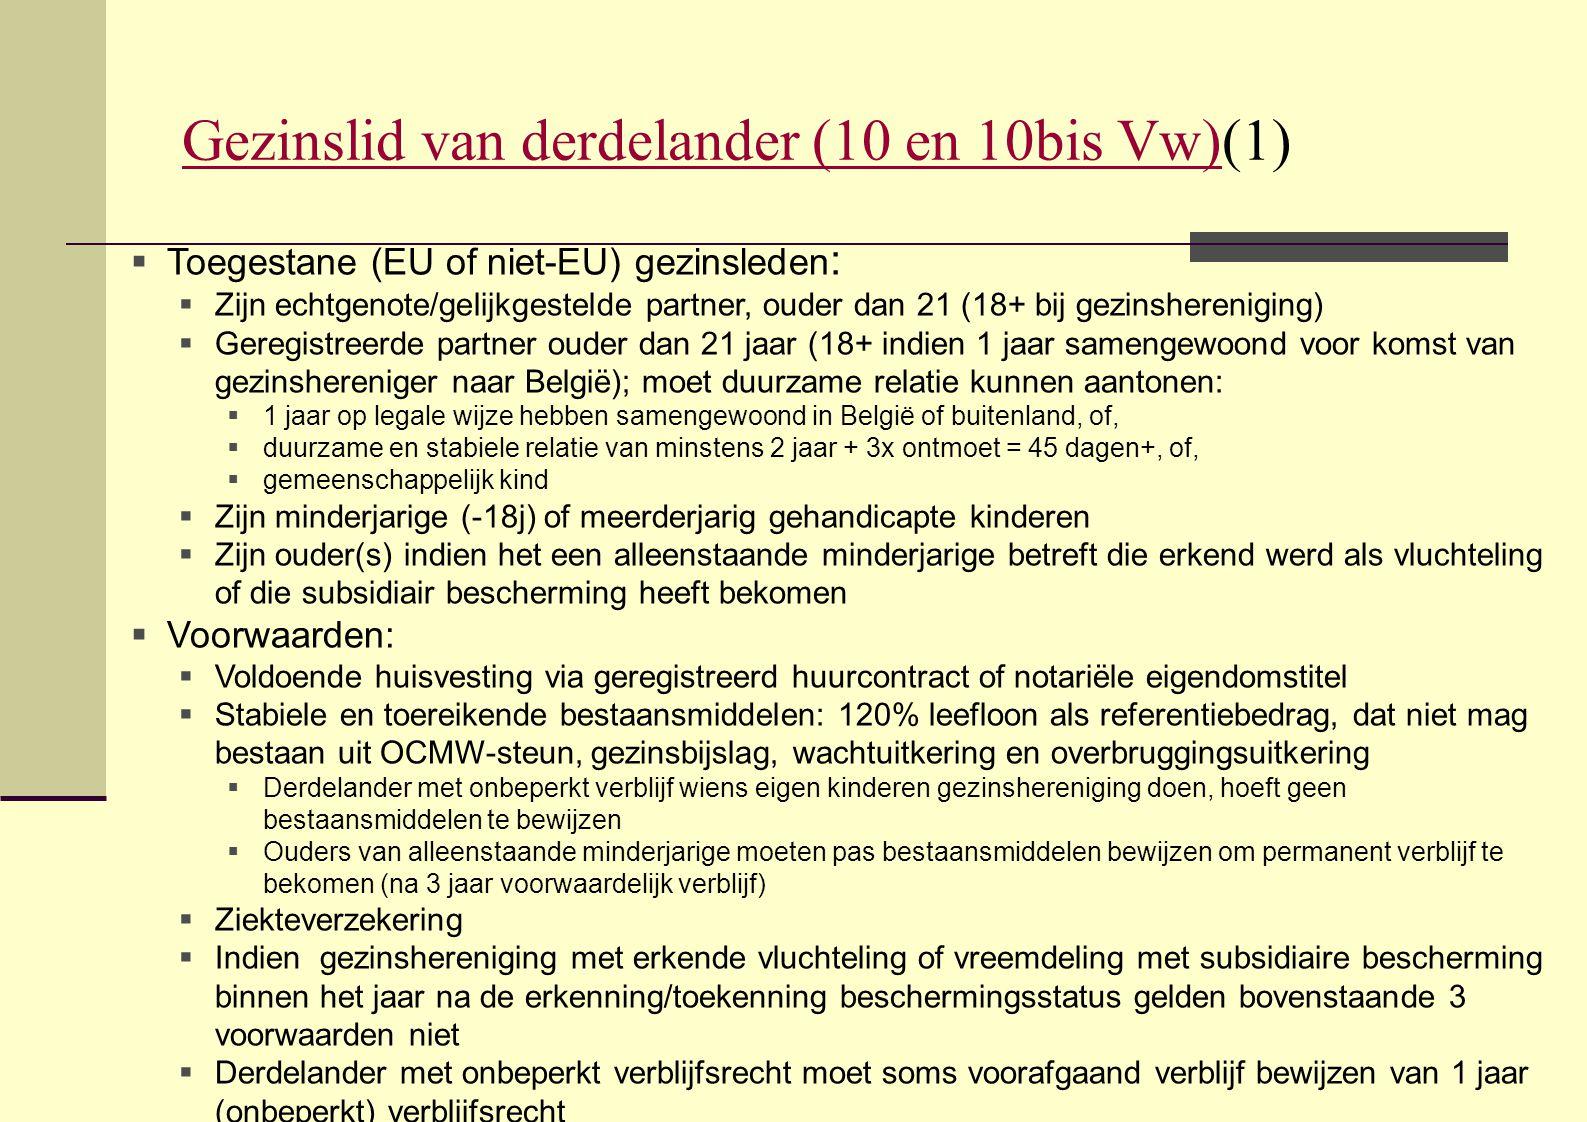 Gezinslid van derdelander (10 en 10bis Vw)Gezinslid van derdelander (10 en 10bis Vw)(1)  Toegestane (EU of niet-EU) gezinsleden :  Zijn echtgenote/g